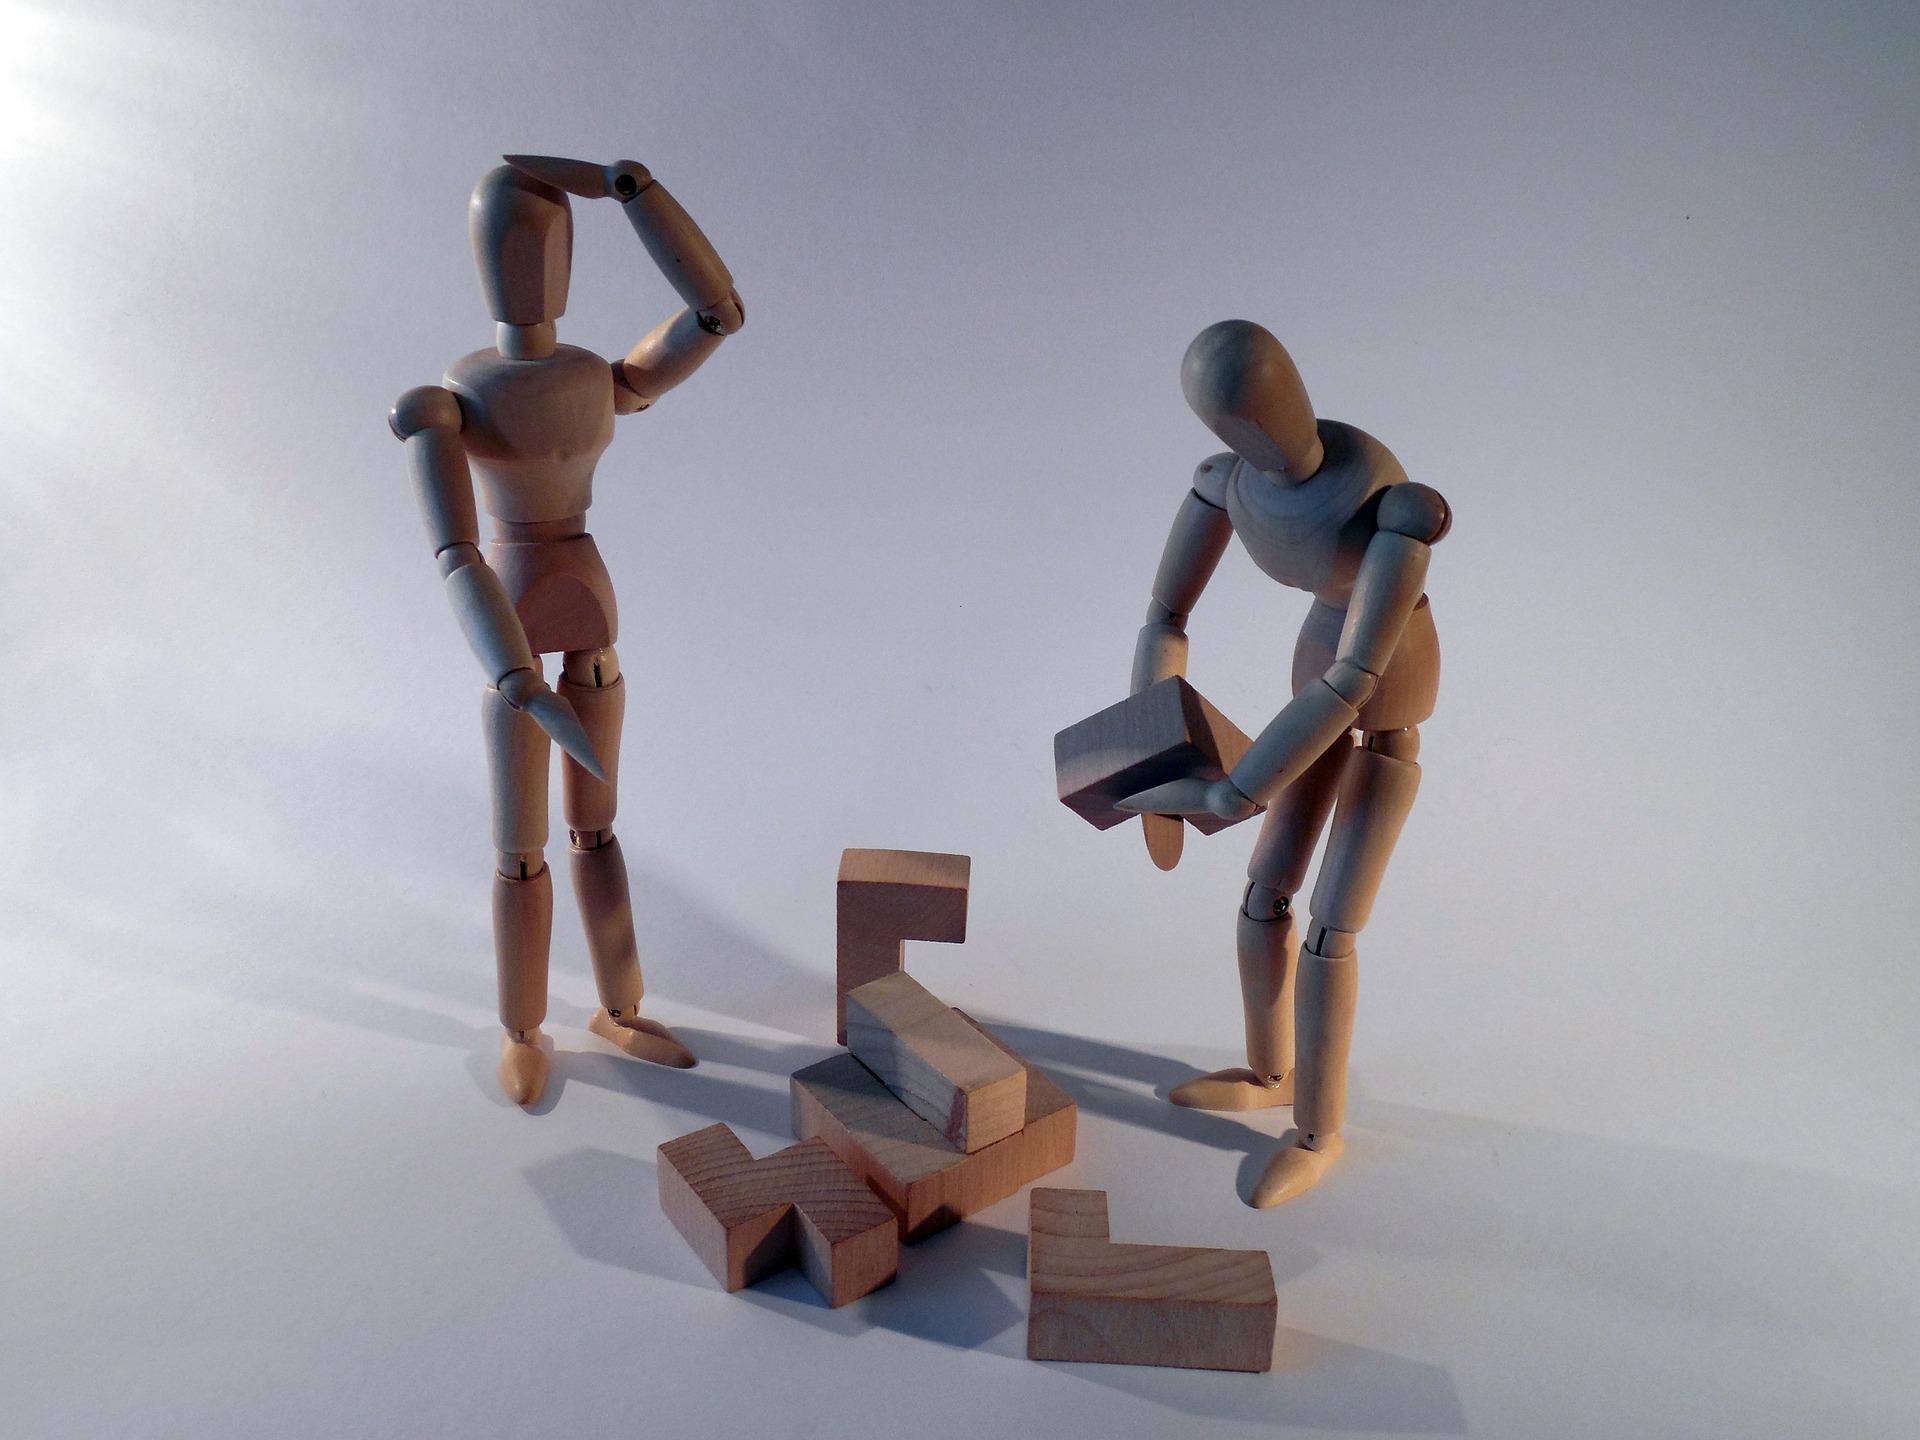 Wooden models building a puzzle